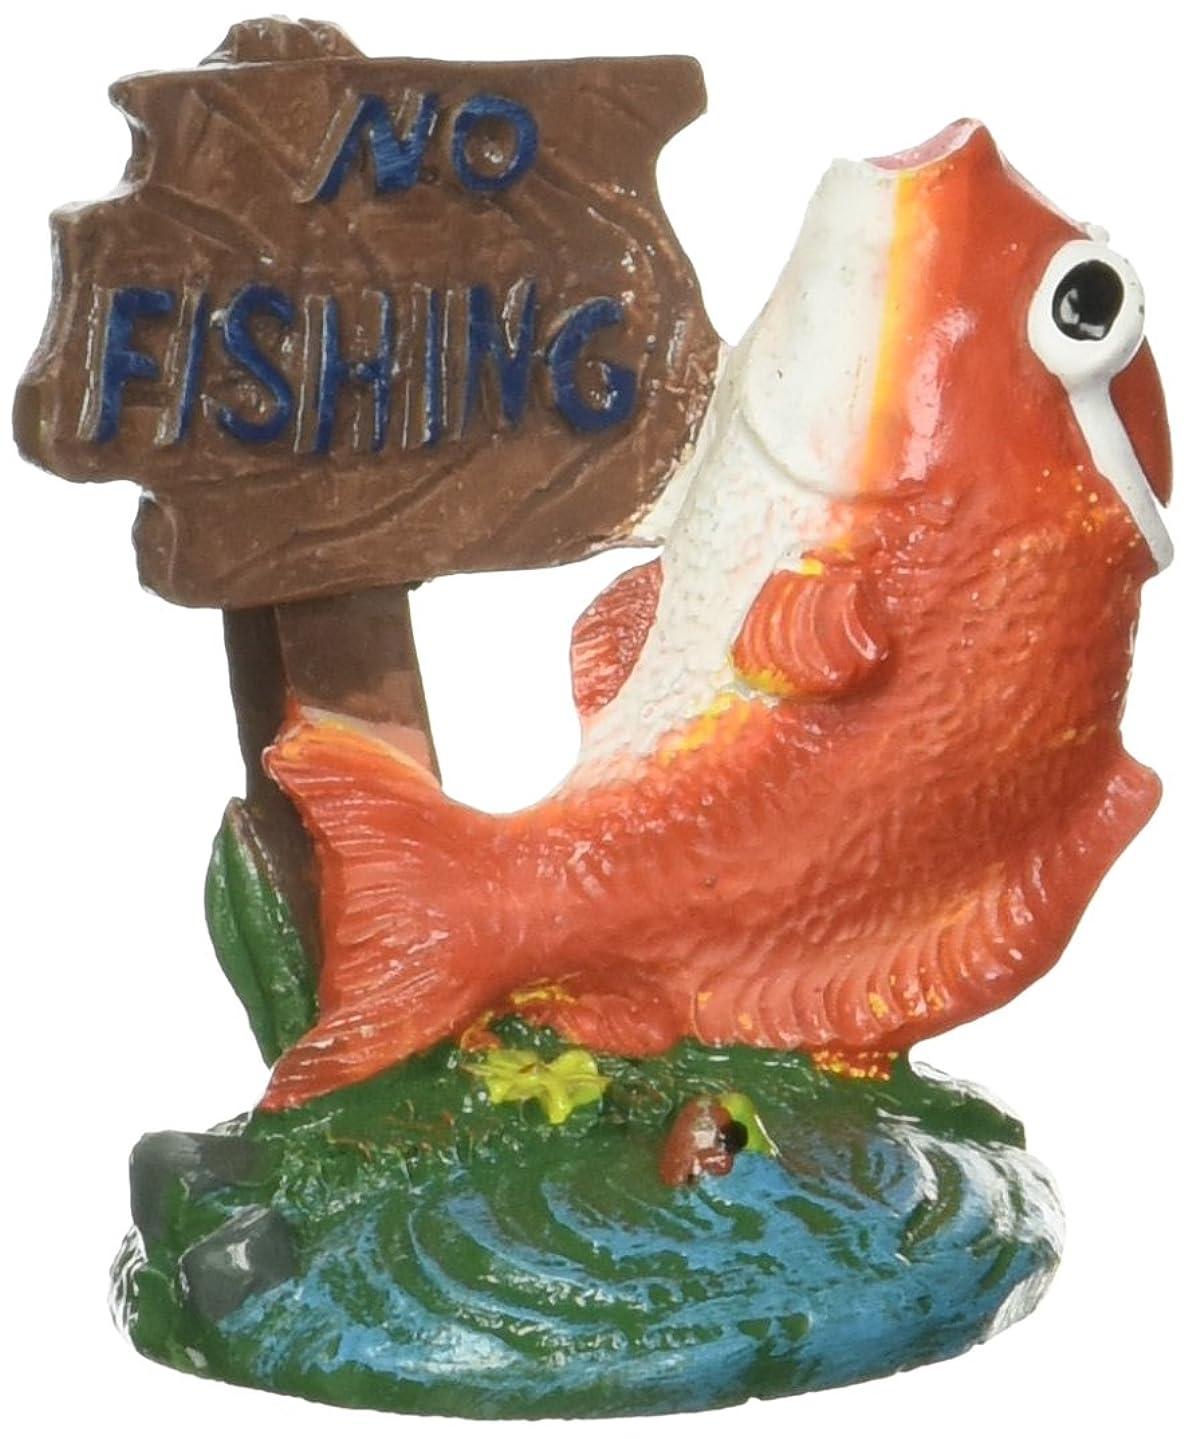 Penn Plax No Fishing Mini Fish Aquarium Ornament